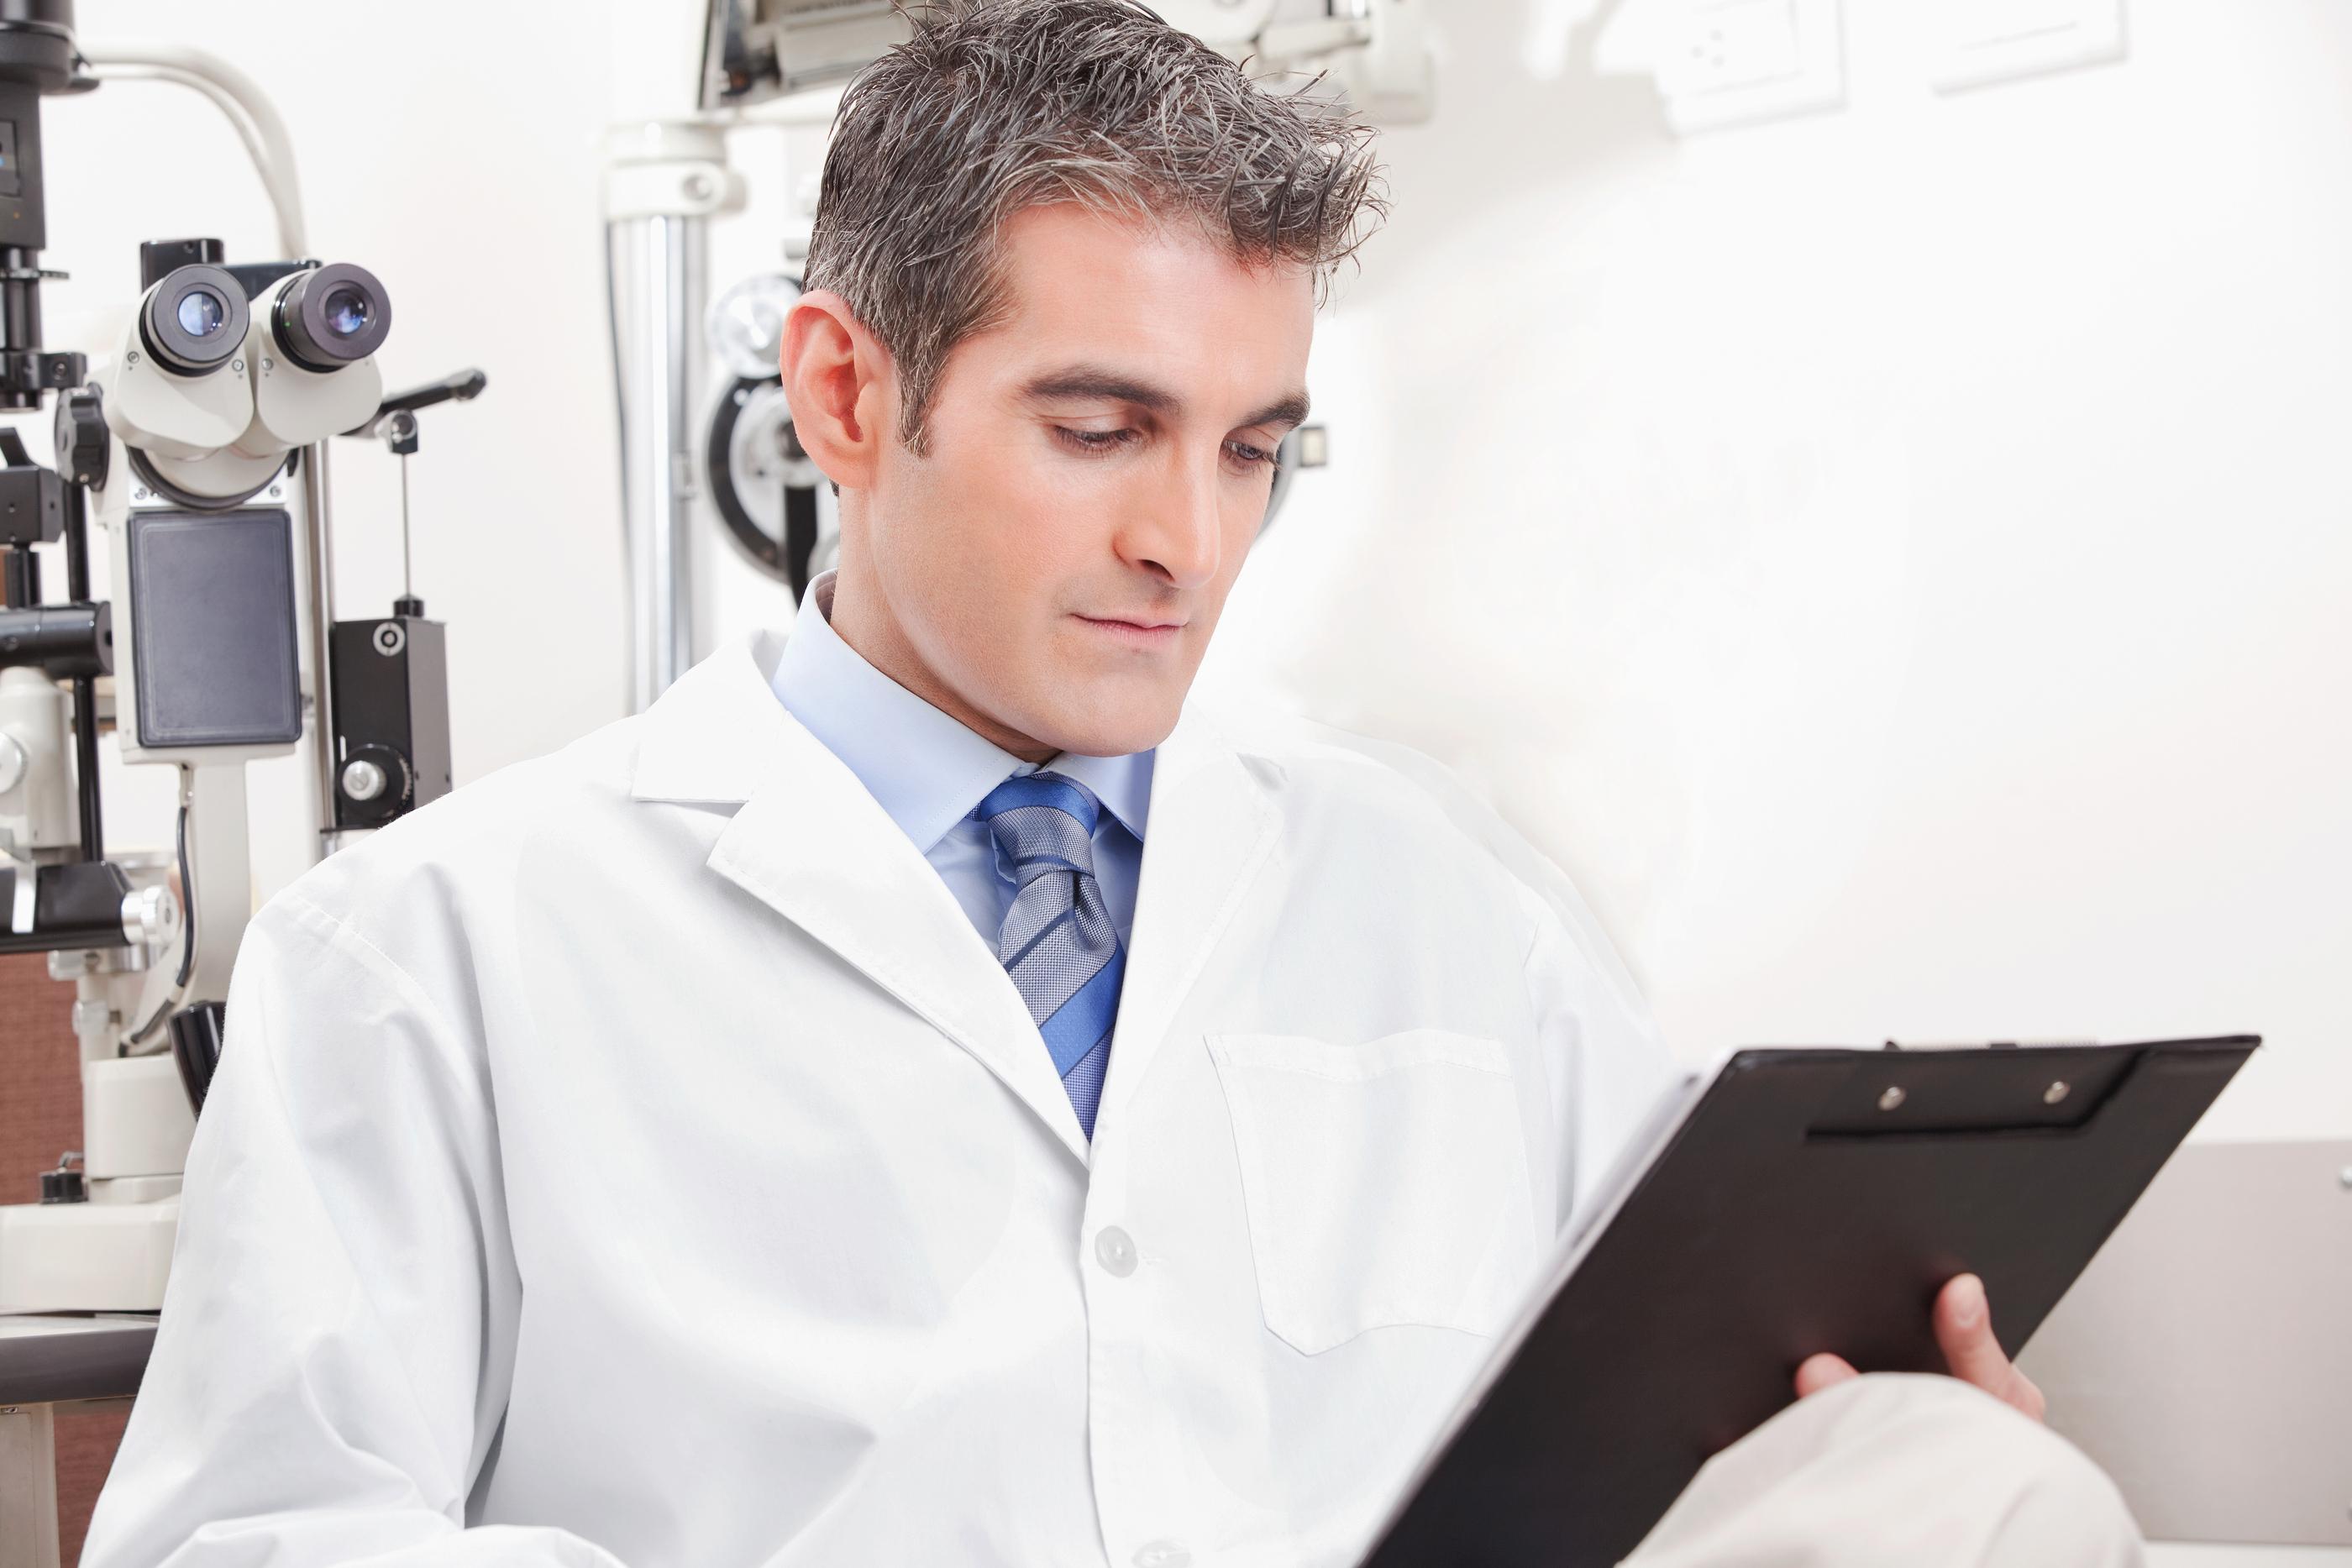 Plano eye doctor glaucoma cataract dry eye treatment